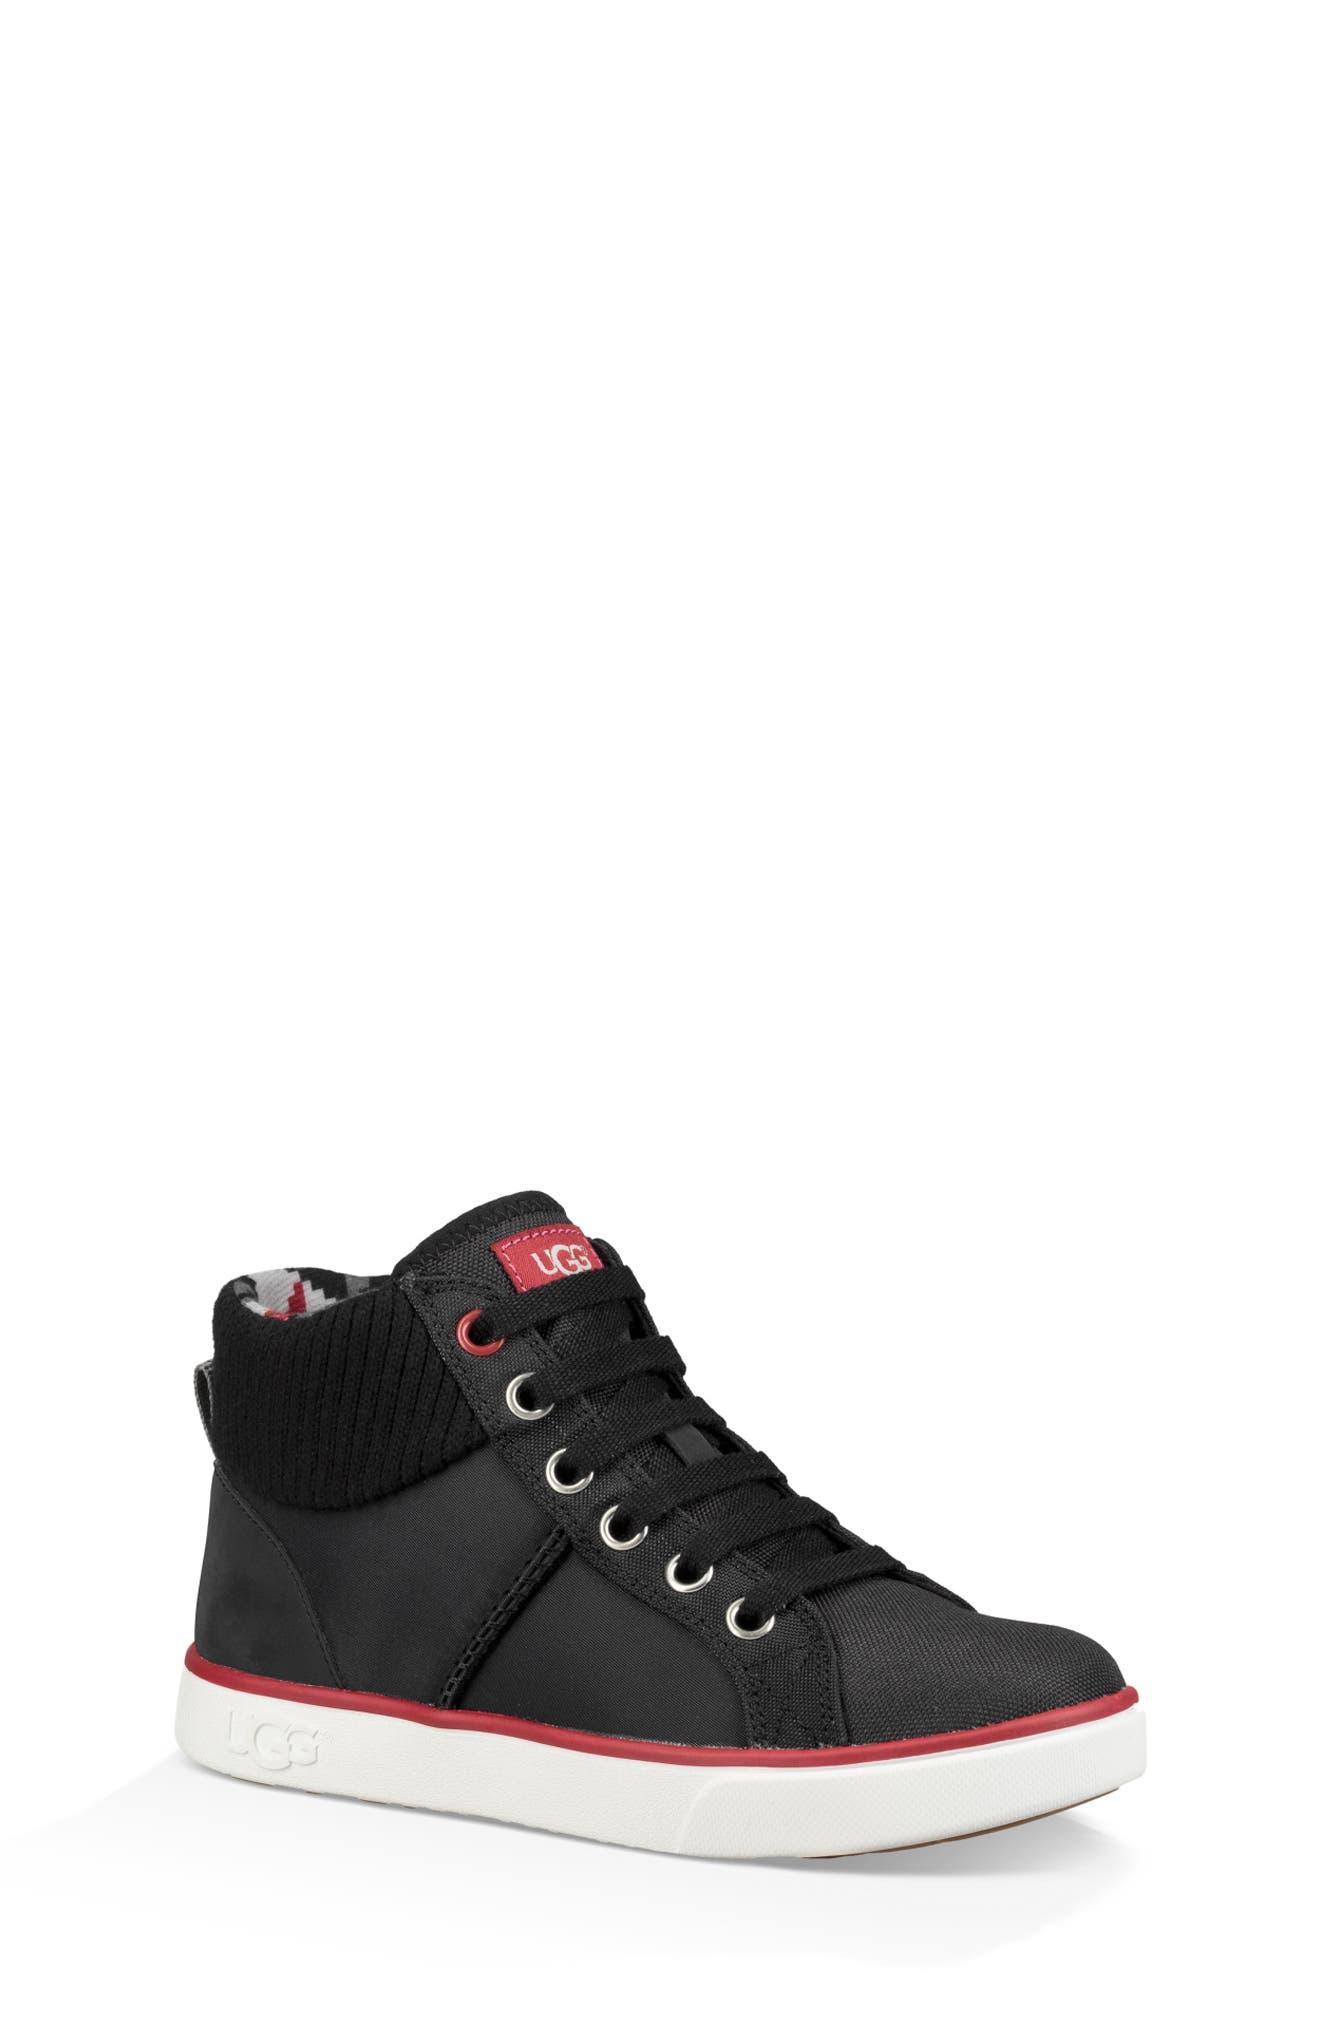 UGG<SUP>®</SUP> Boscoe Sneaker, Main, color, 001